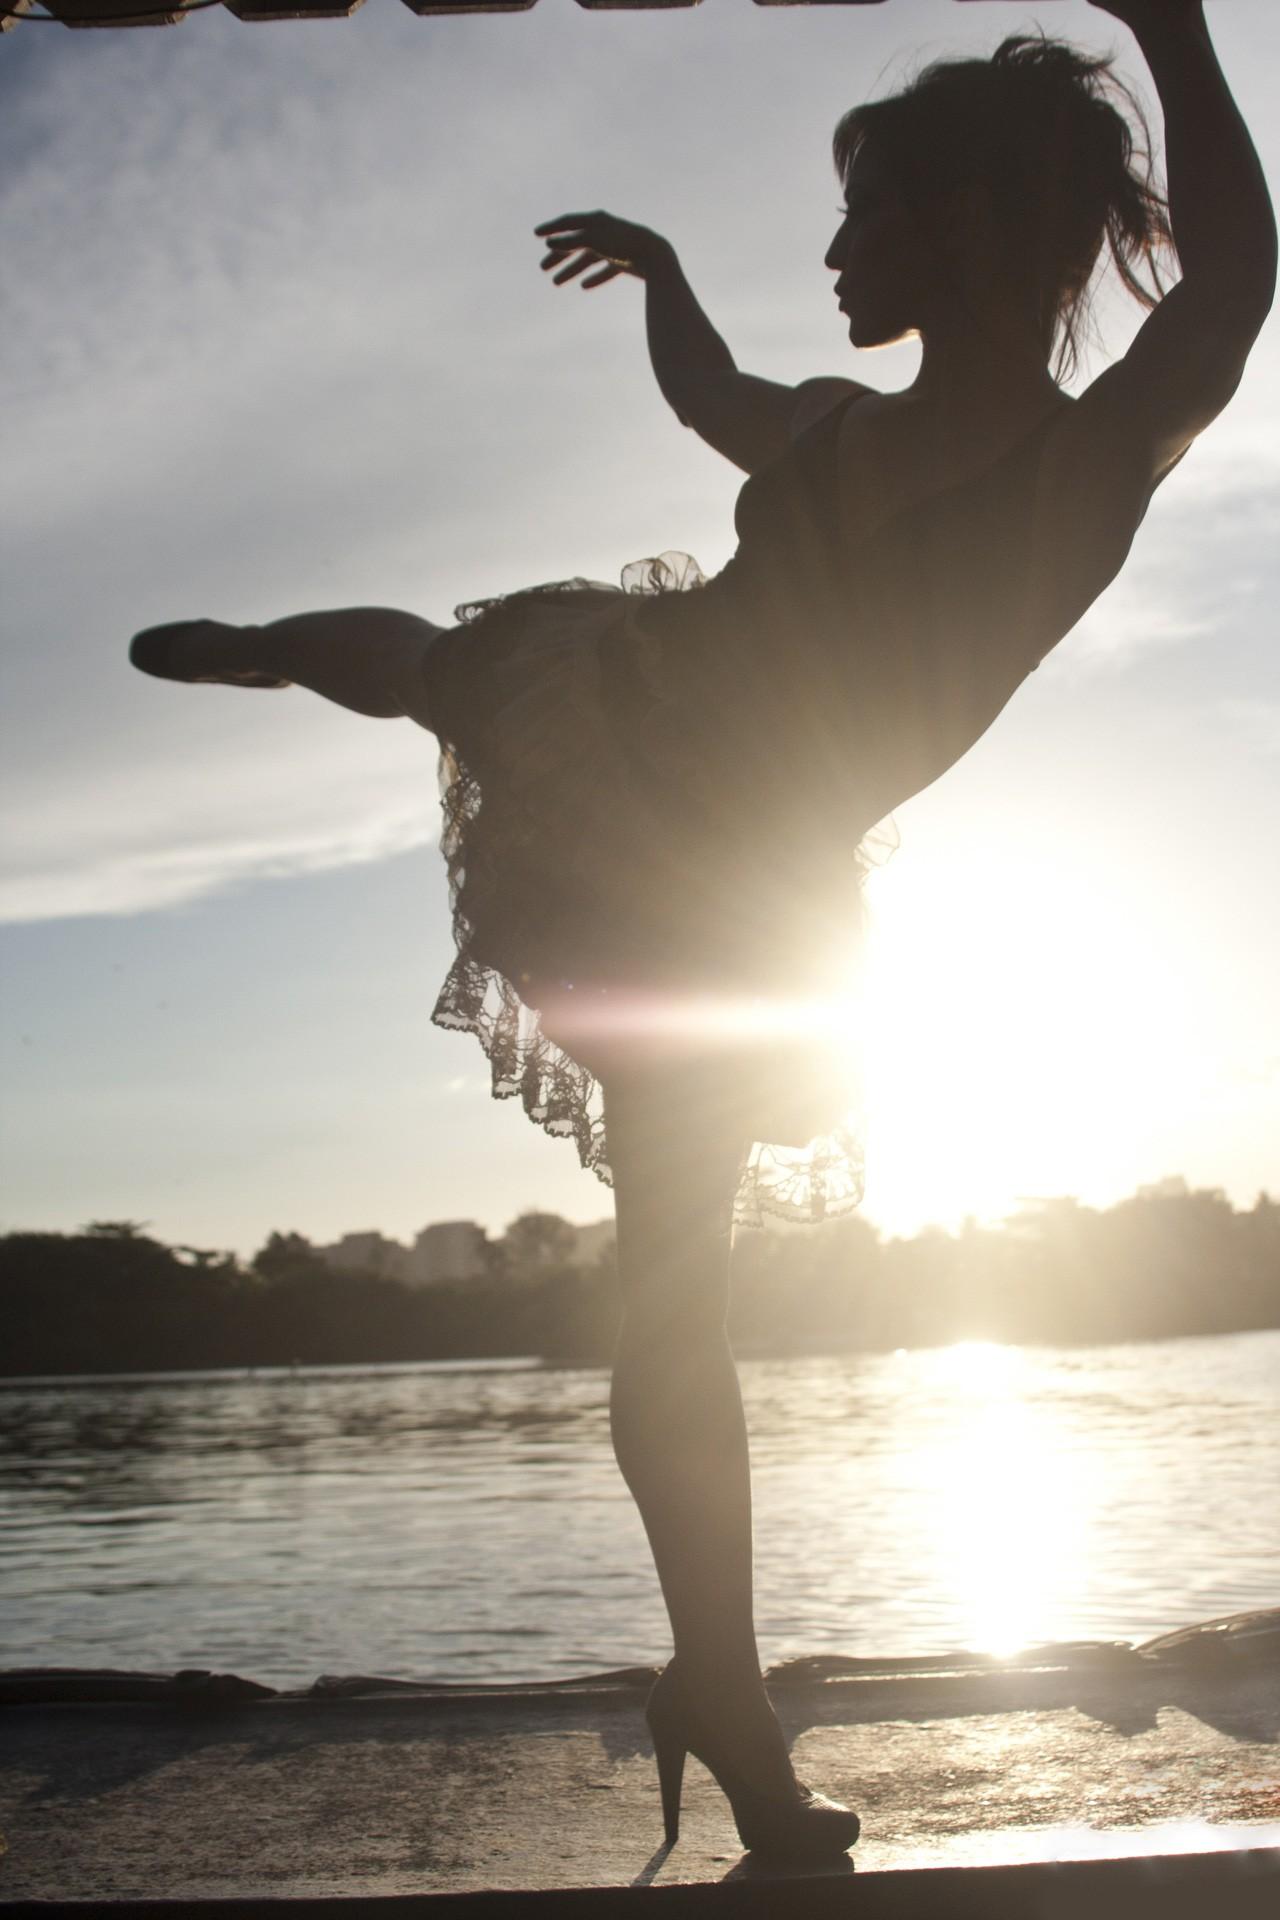 Seu sonho, ela define, sempre foi danar: O ideal foi juntar circo e dana (Foto: Divulgao)